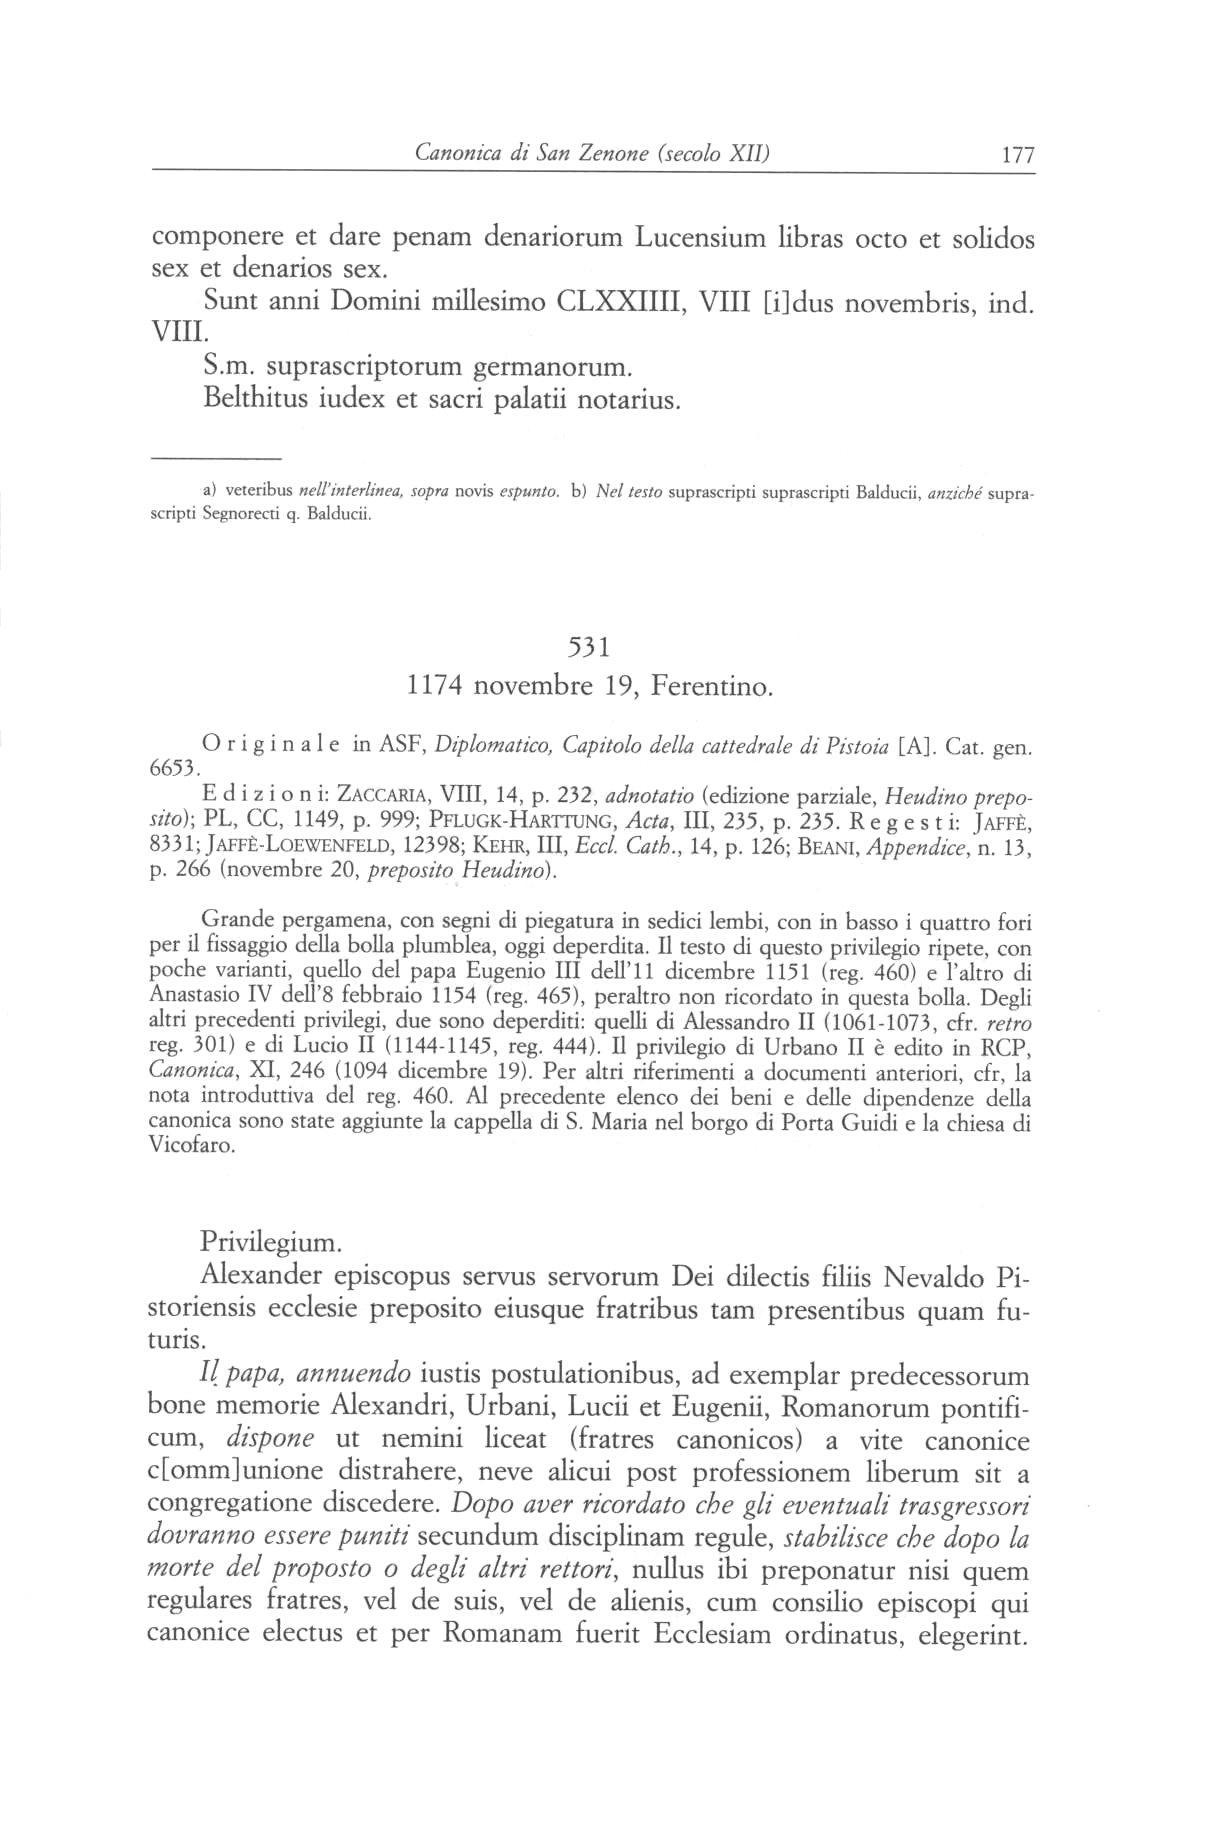 Canonica S. Zenone XII 0177.jpg